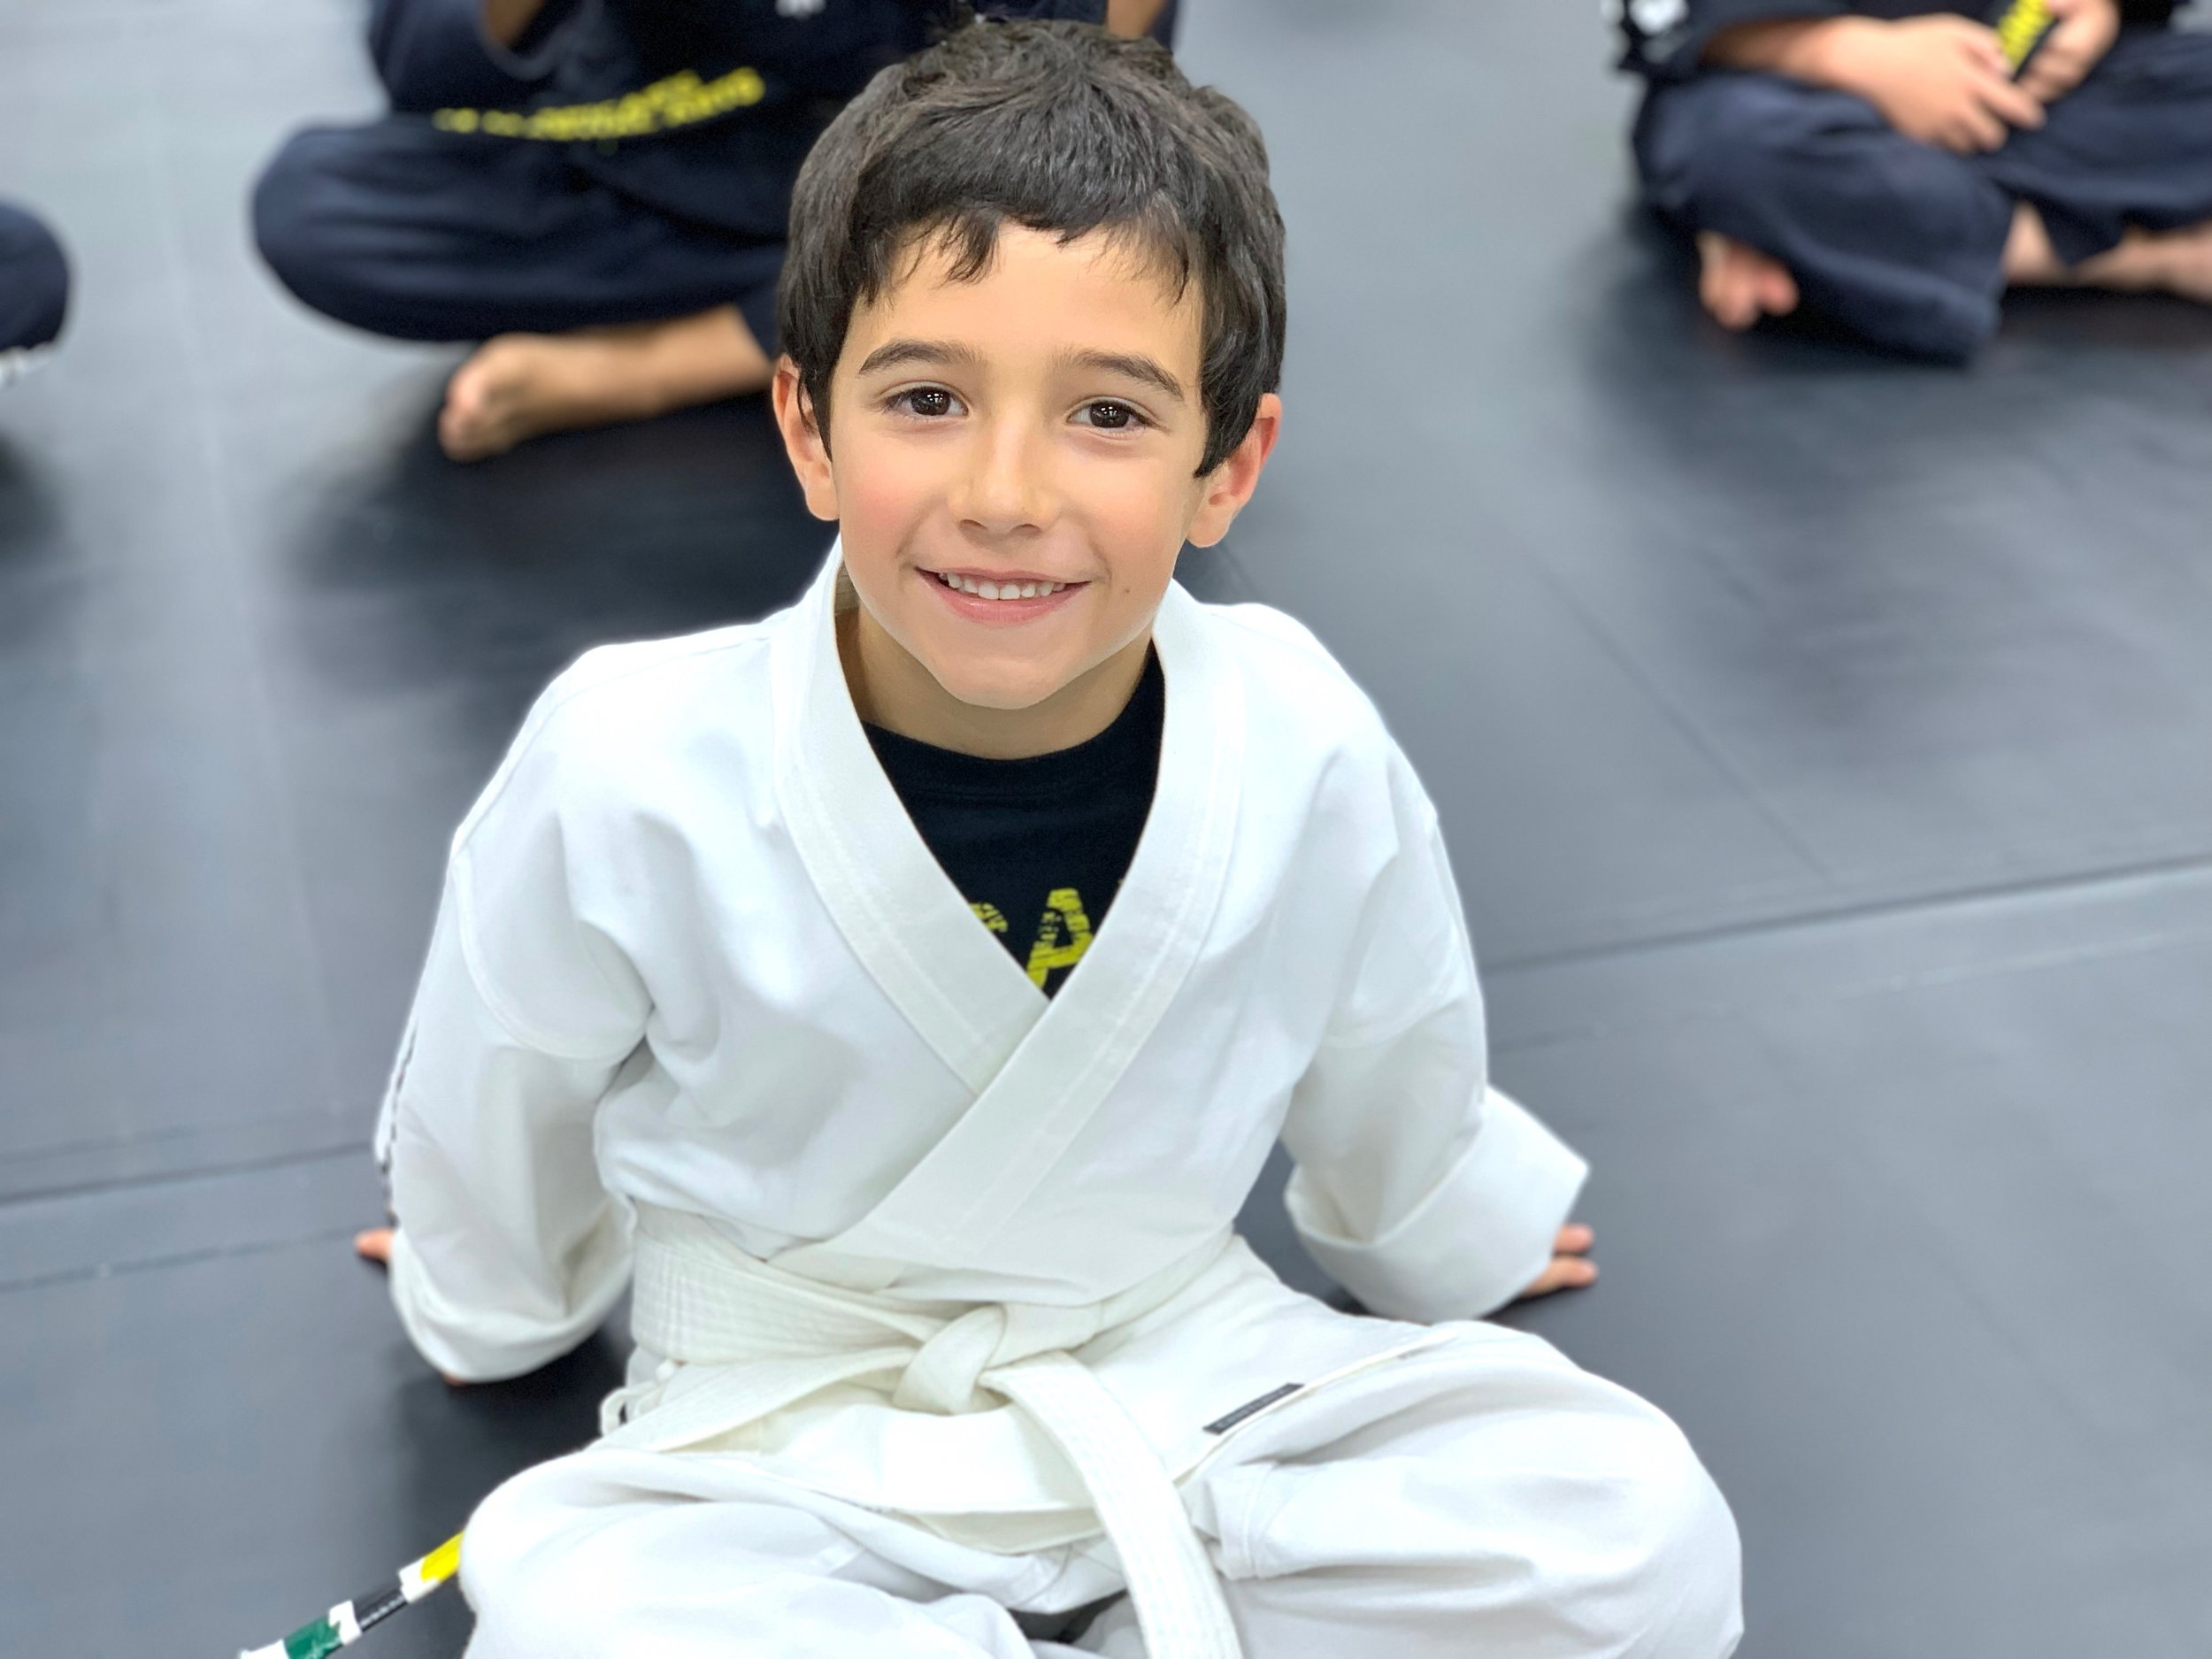 karate-kids-program-souhtlake-keller-grapevine-texas00043.jpeg